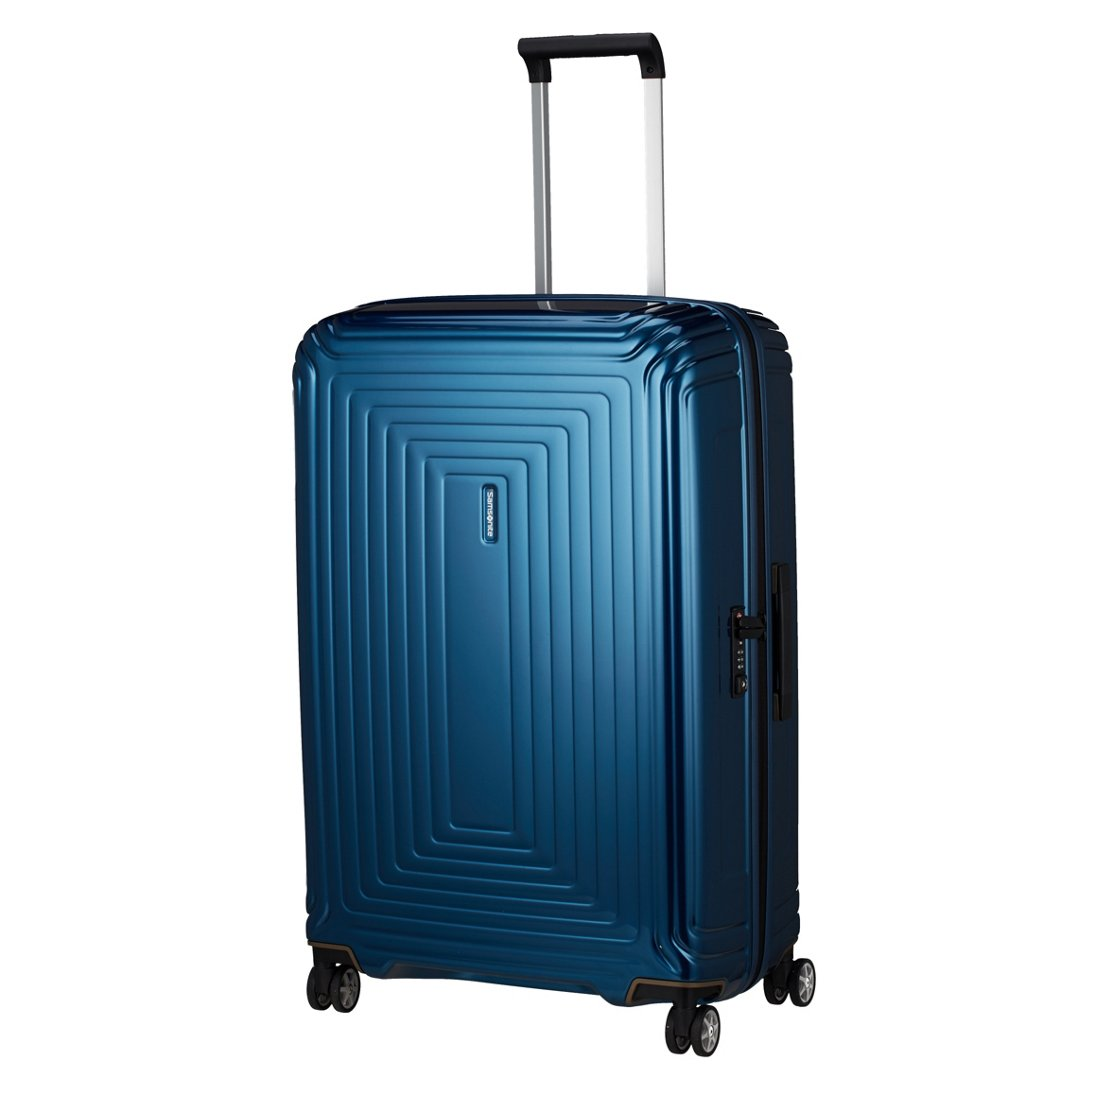 samsonite neopulse 4-rollen-trolley 75 cm - metallic blue - koffer